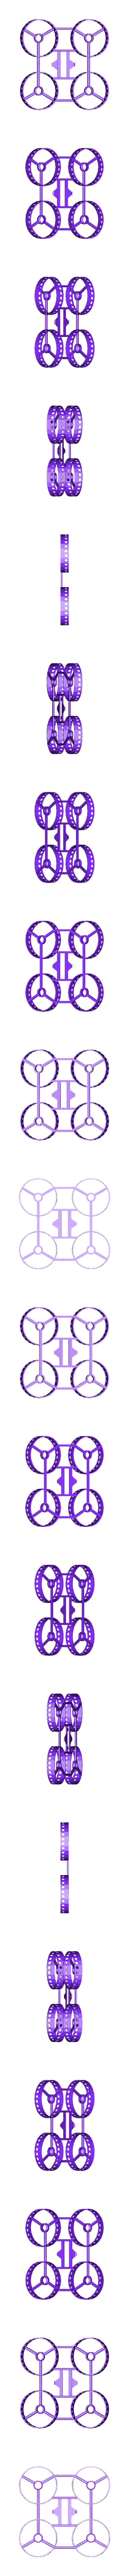 beecheeseframe_v02_50mmProps_1_2mmDucts_tankedition.stl Télécharger fichier STL gratuit Cadre semi-dirigé micro (cadre en Beecheese) • Plan à imprimer en 3D, noctaro